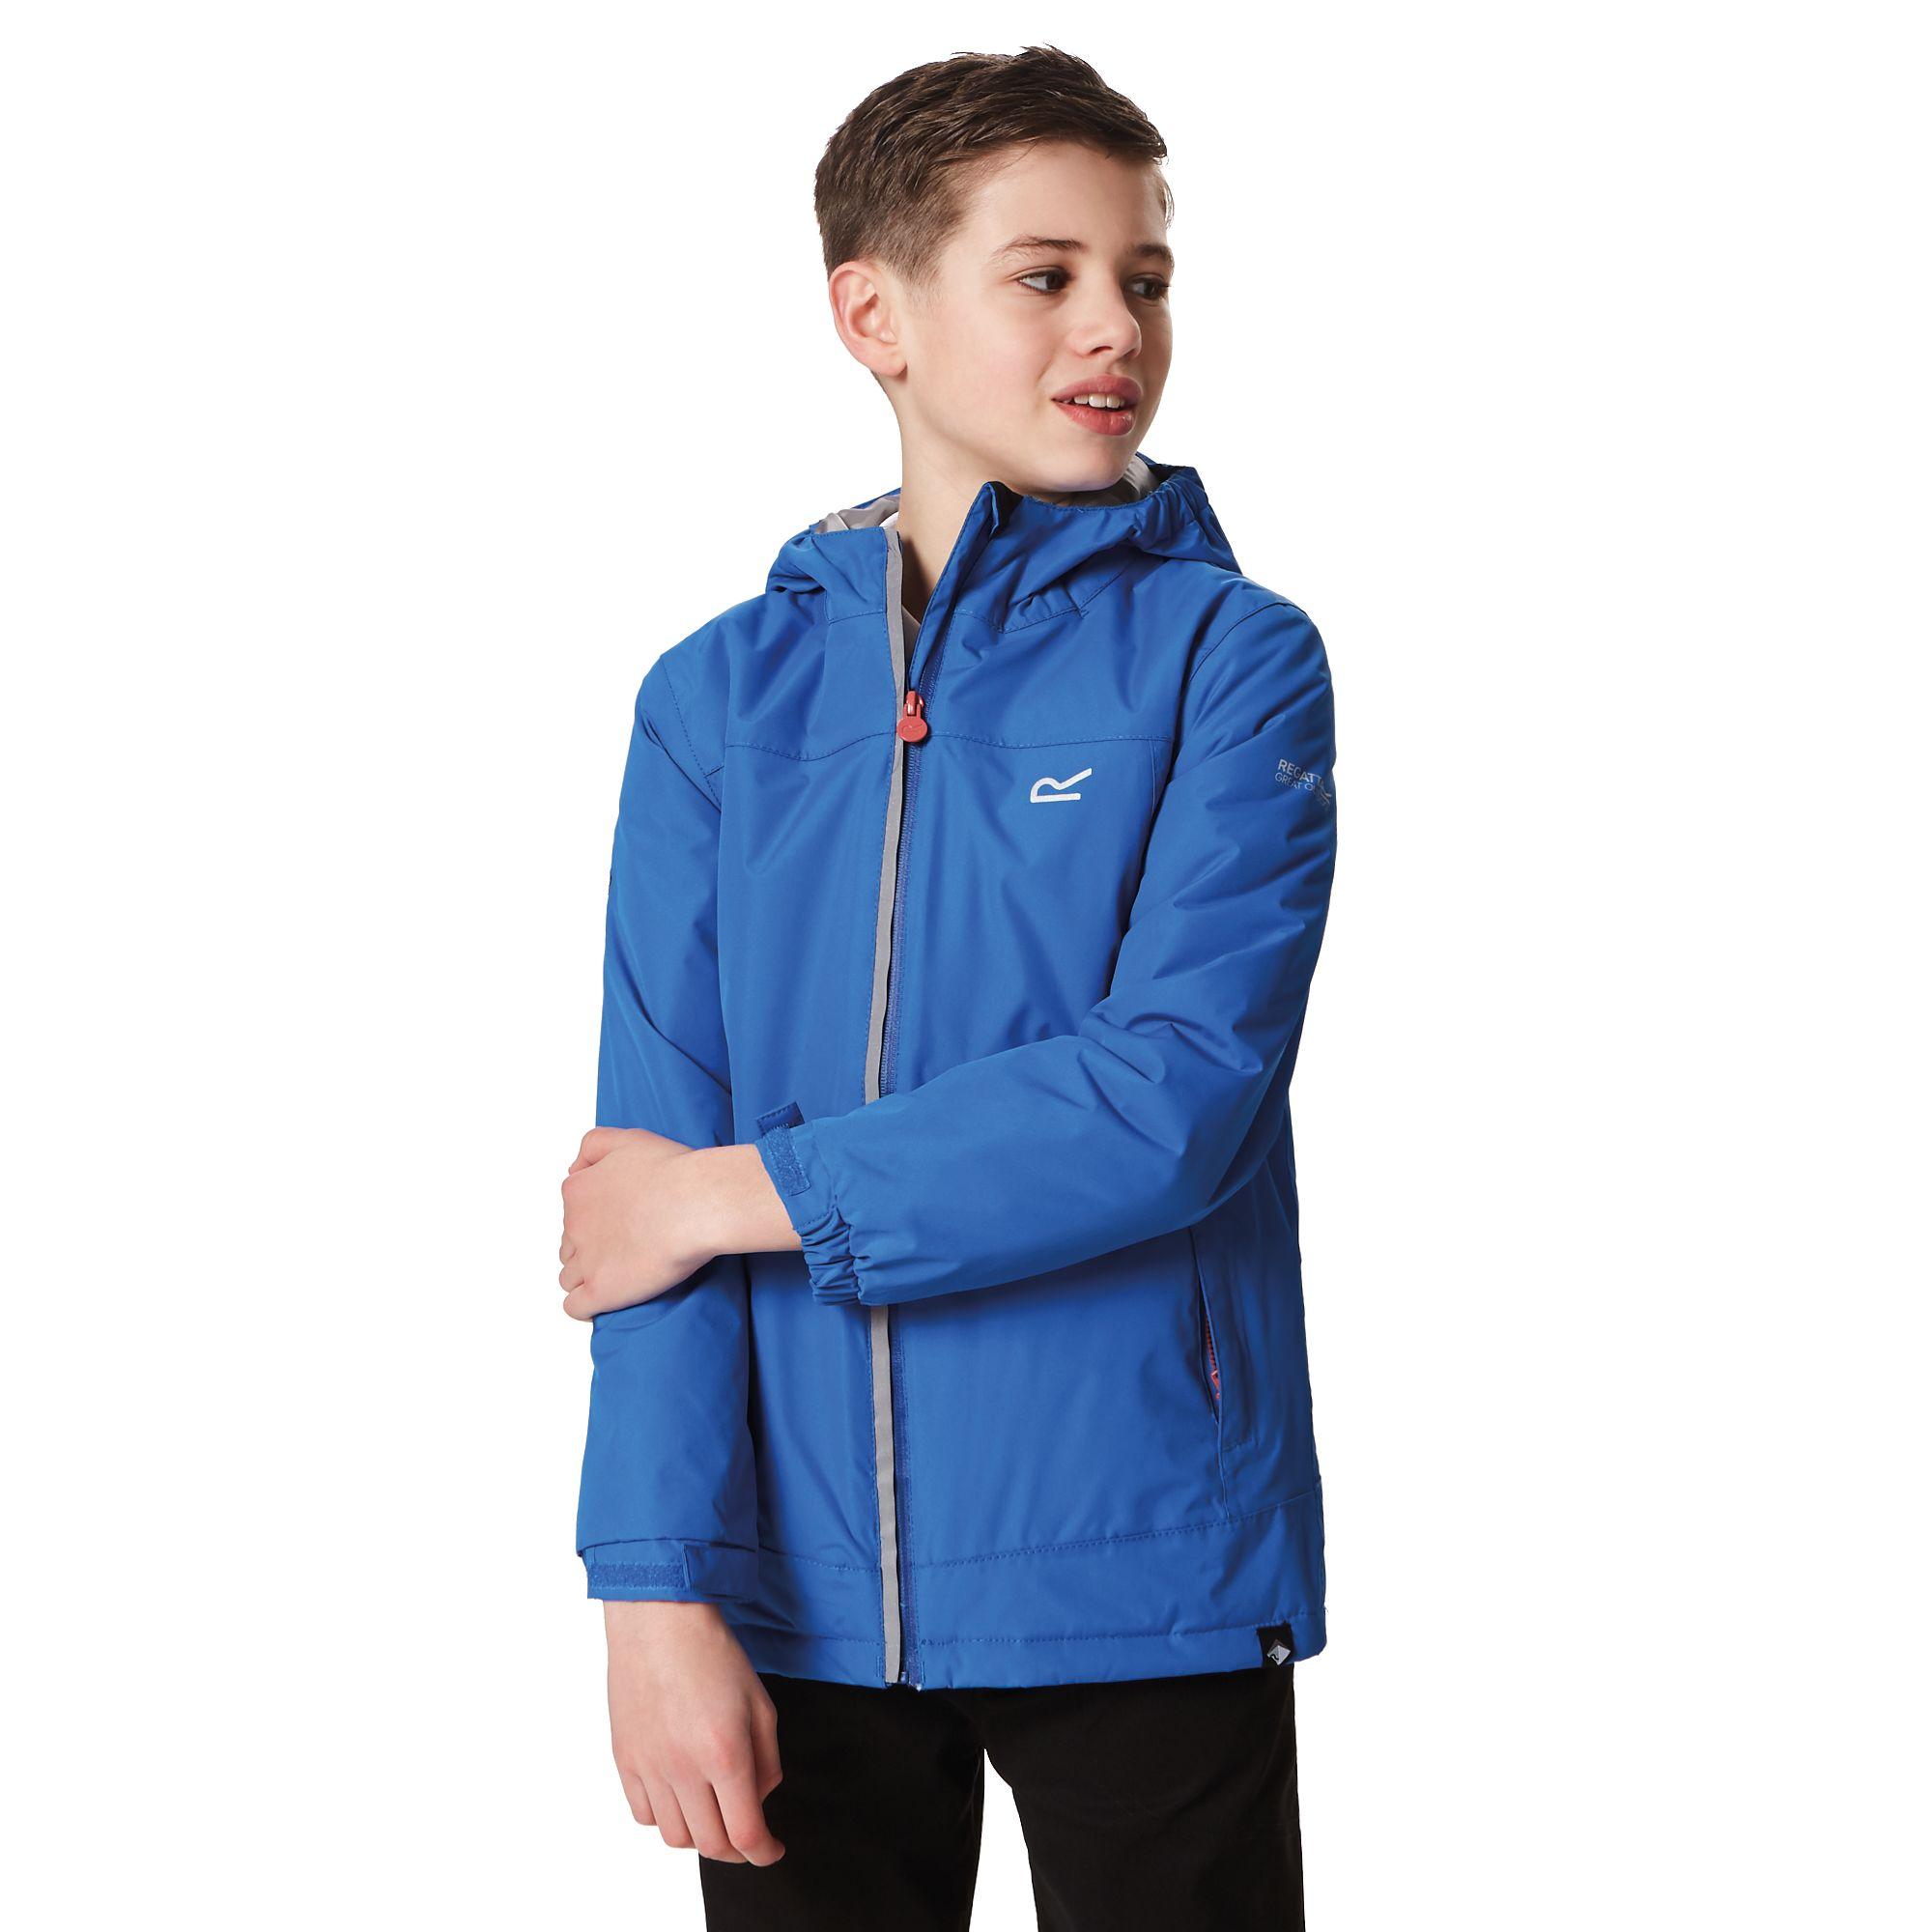 936151128 Regatta HURDLE II WATERPROOF INSULATED JACKET - Oxford Blue